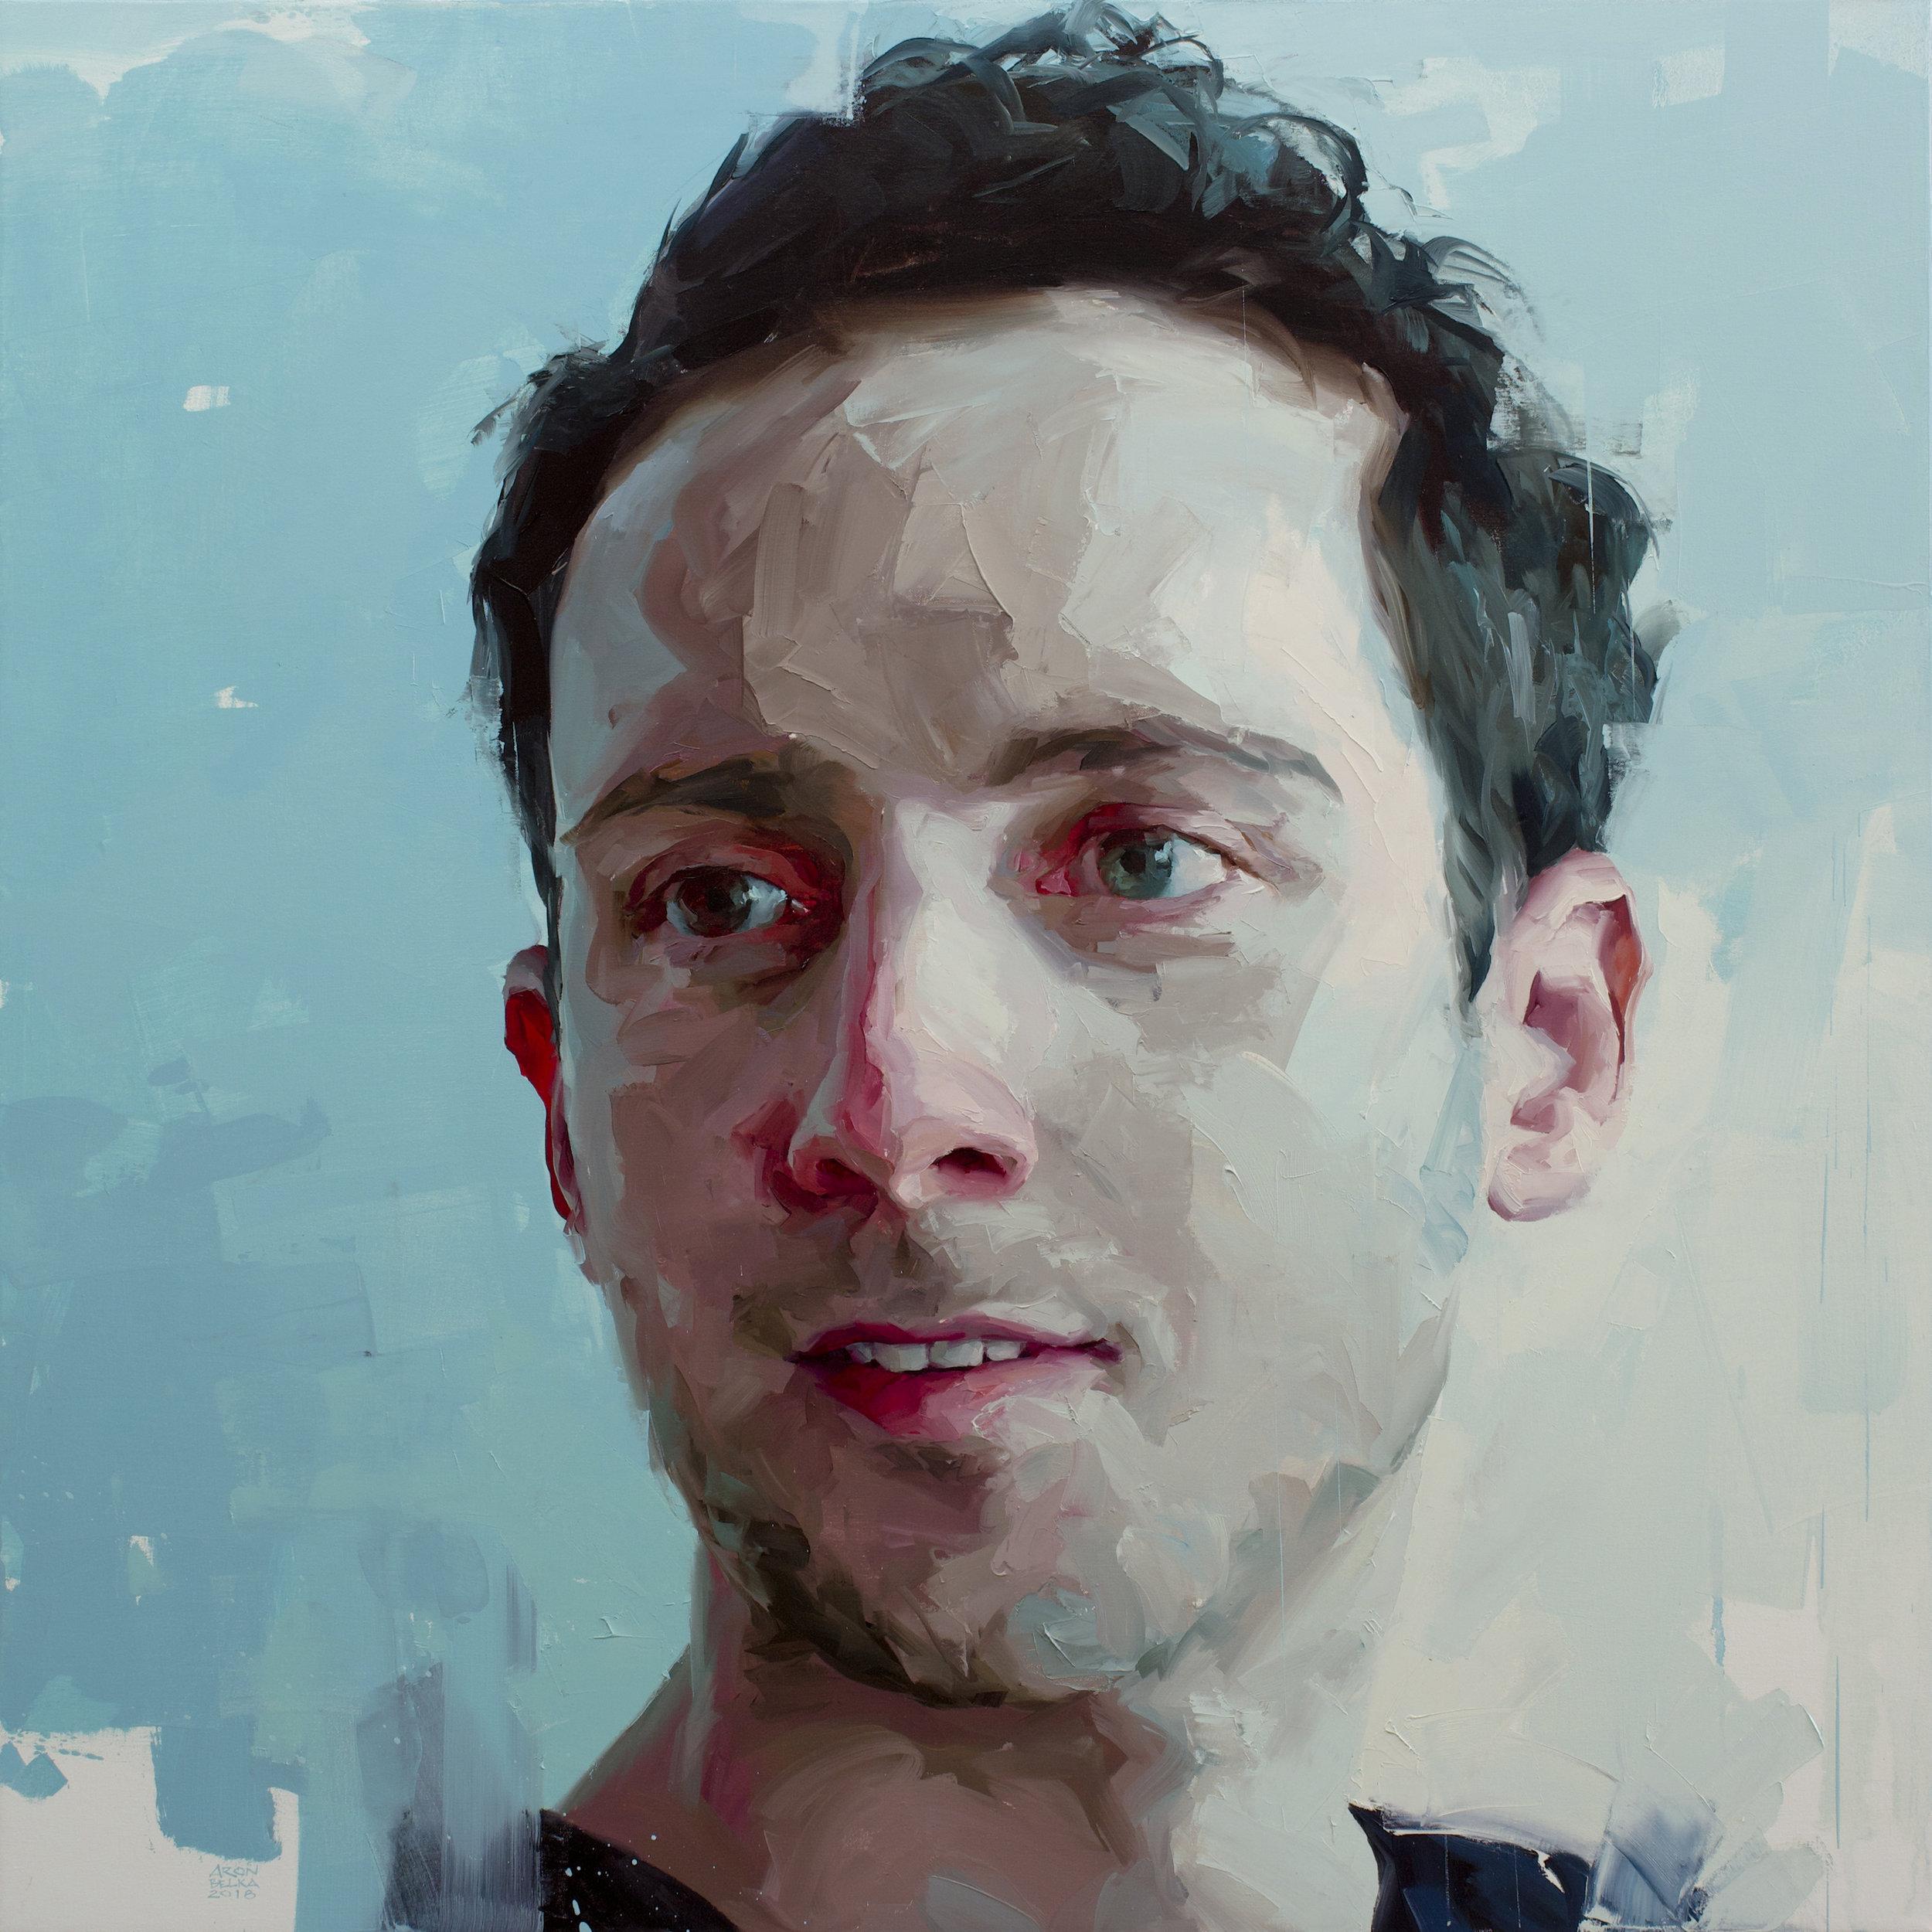 Joshua Edward Bennett   2018 48 x 48 inches   oil on canvas